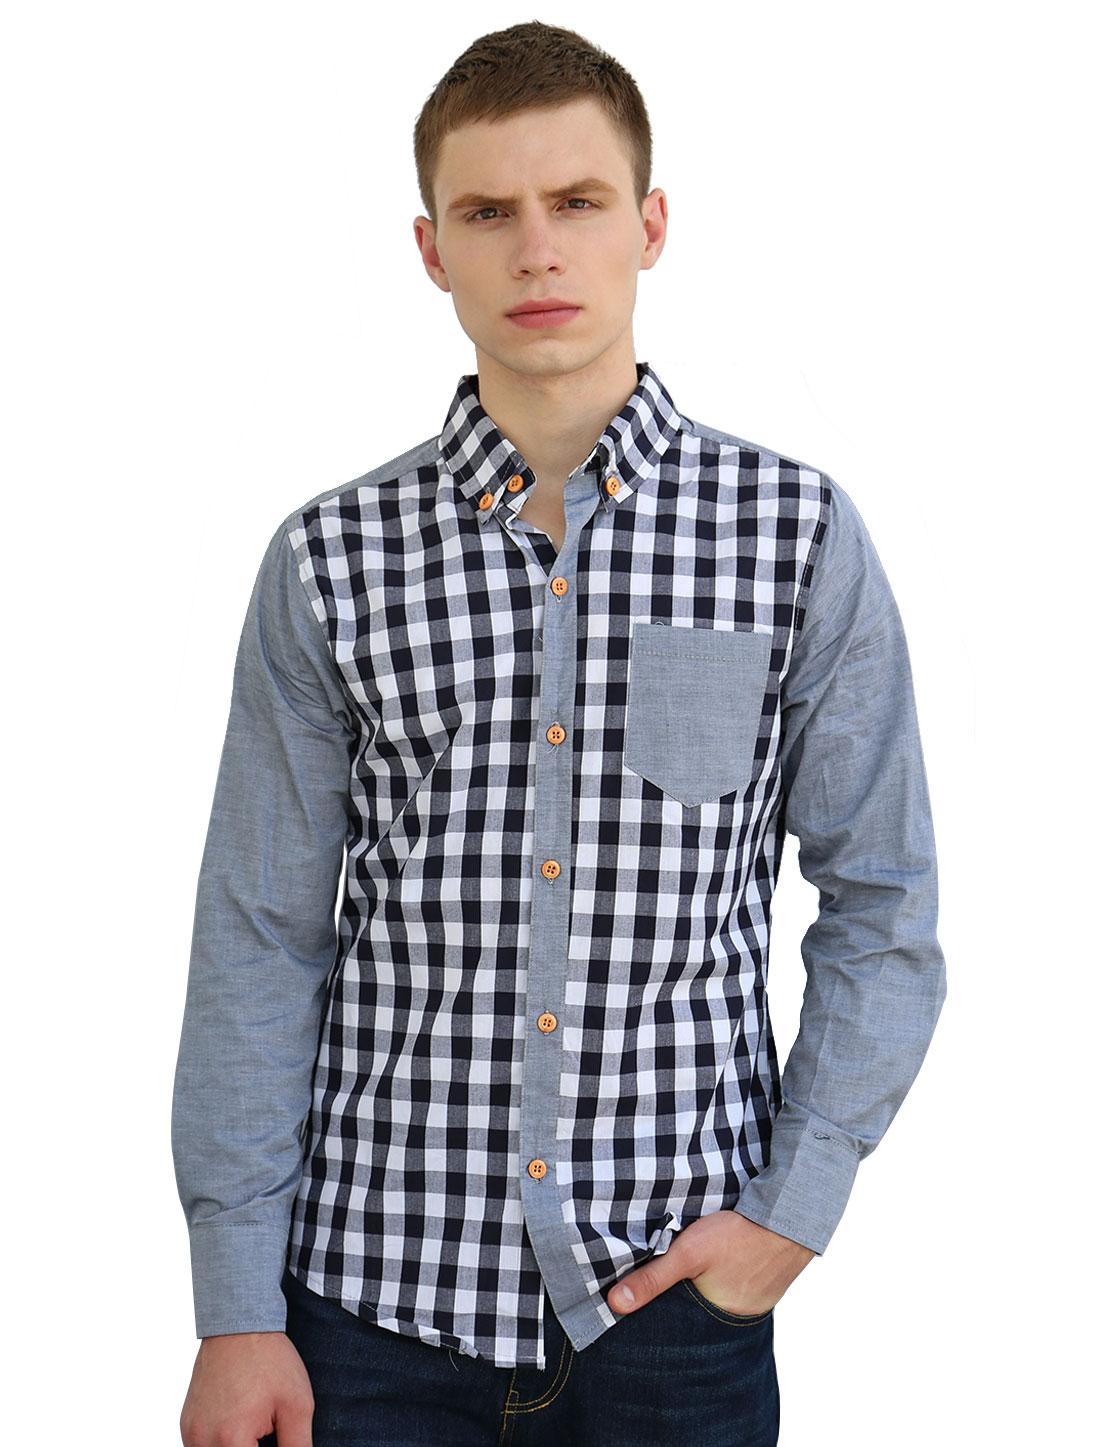 Men Long Sleeves Yarn-Dyed Plaids Button Down Shirt Light Gray L